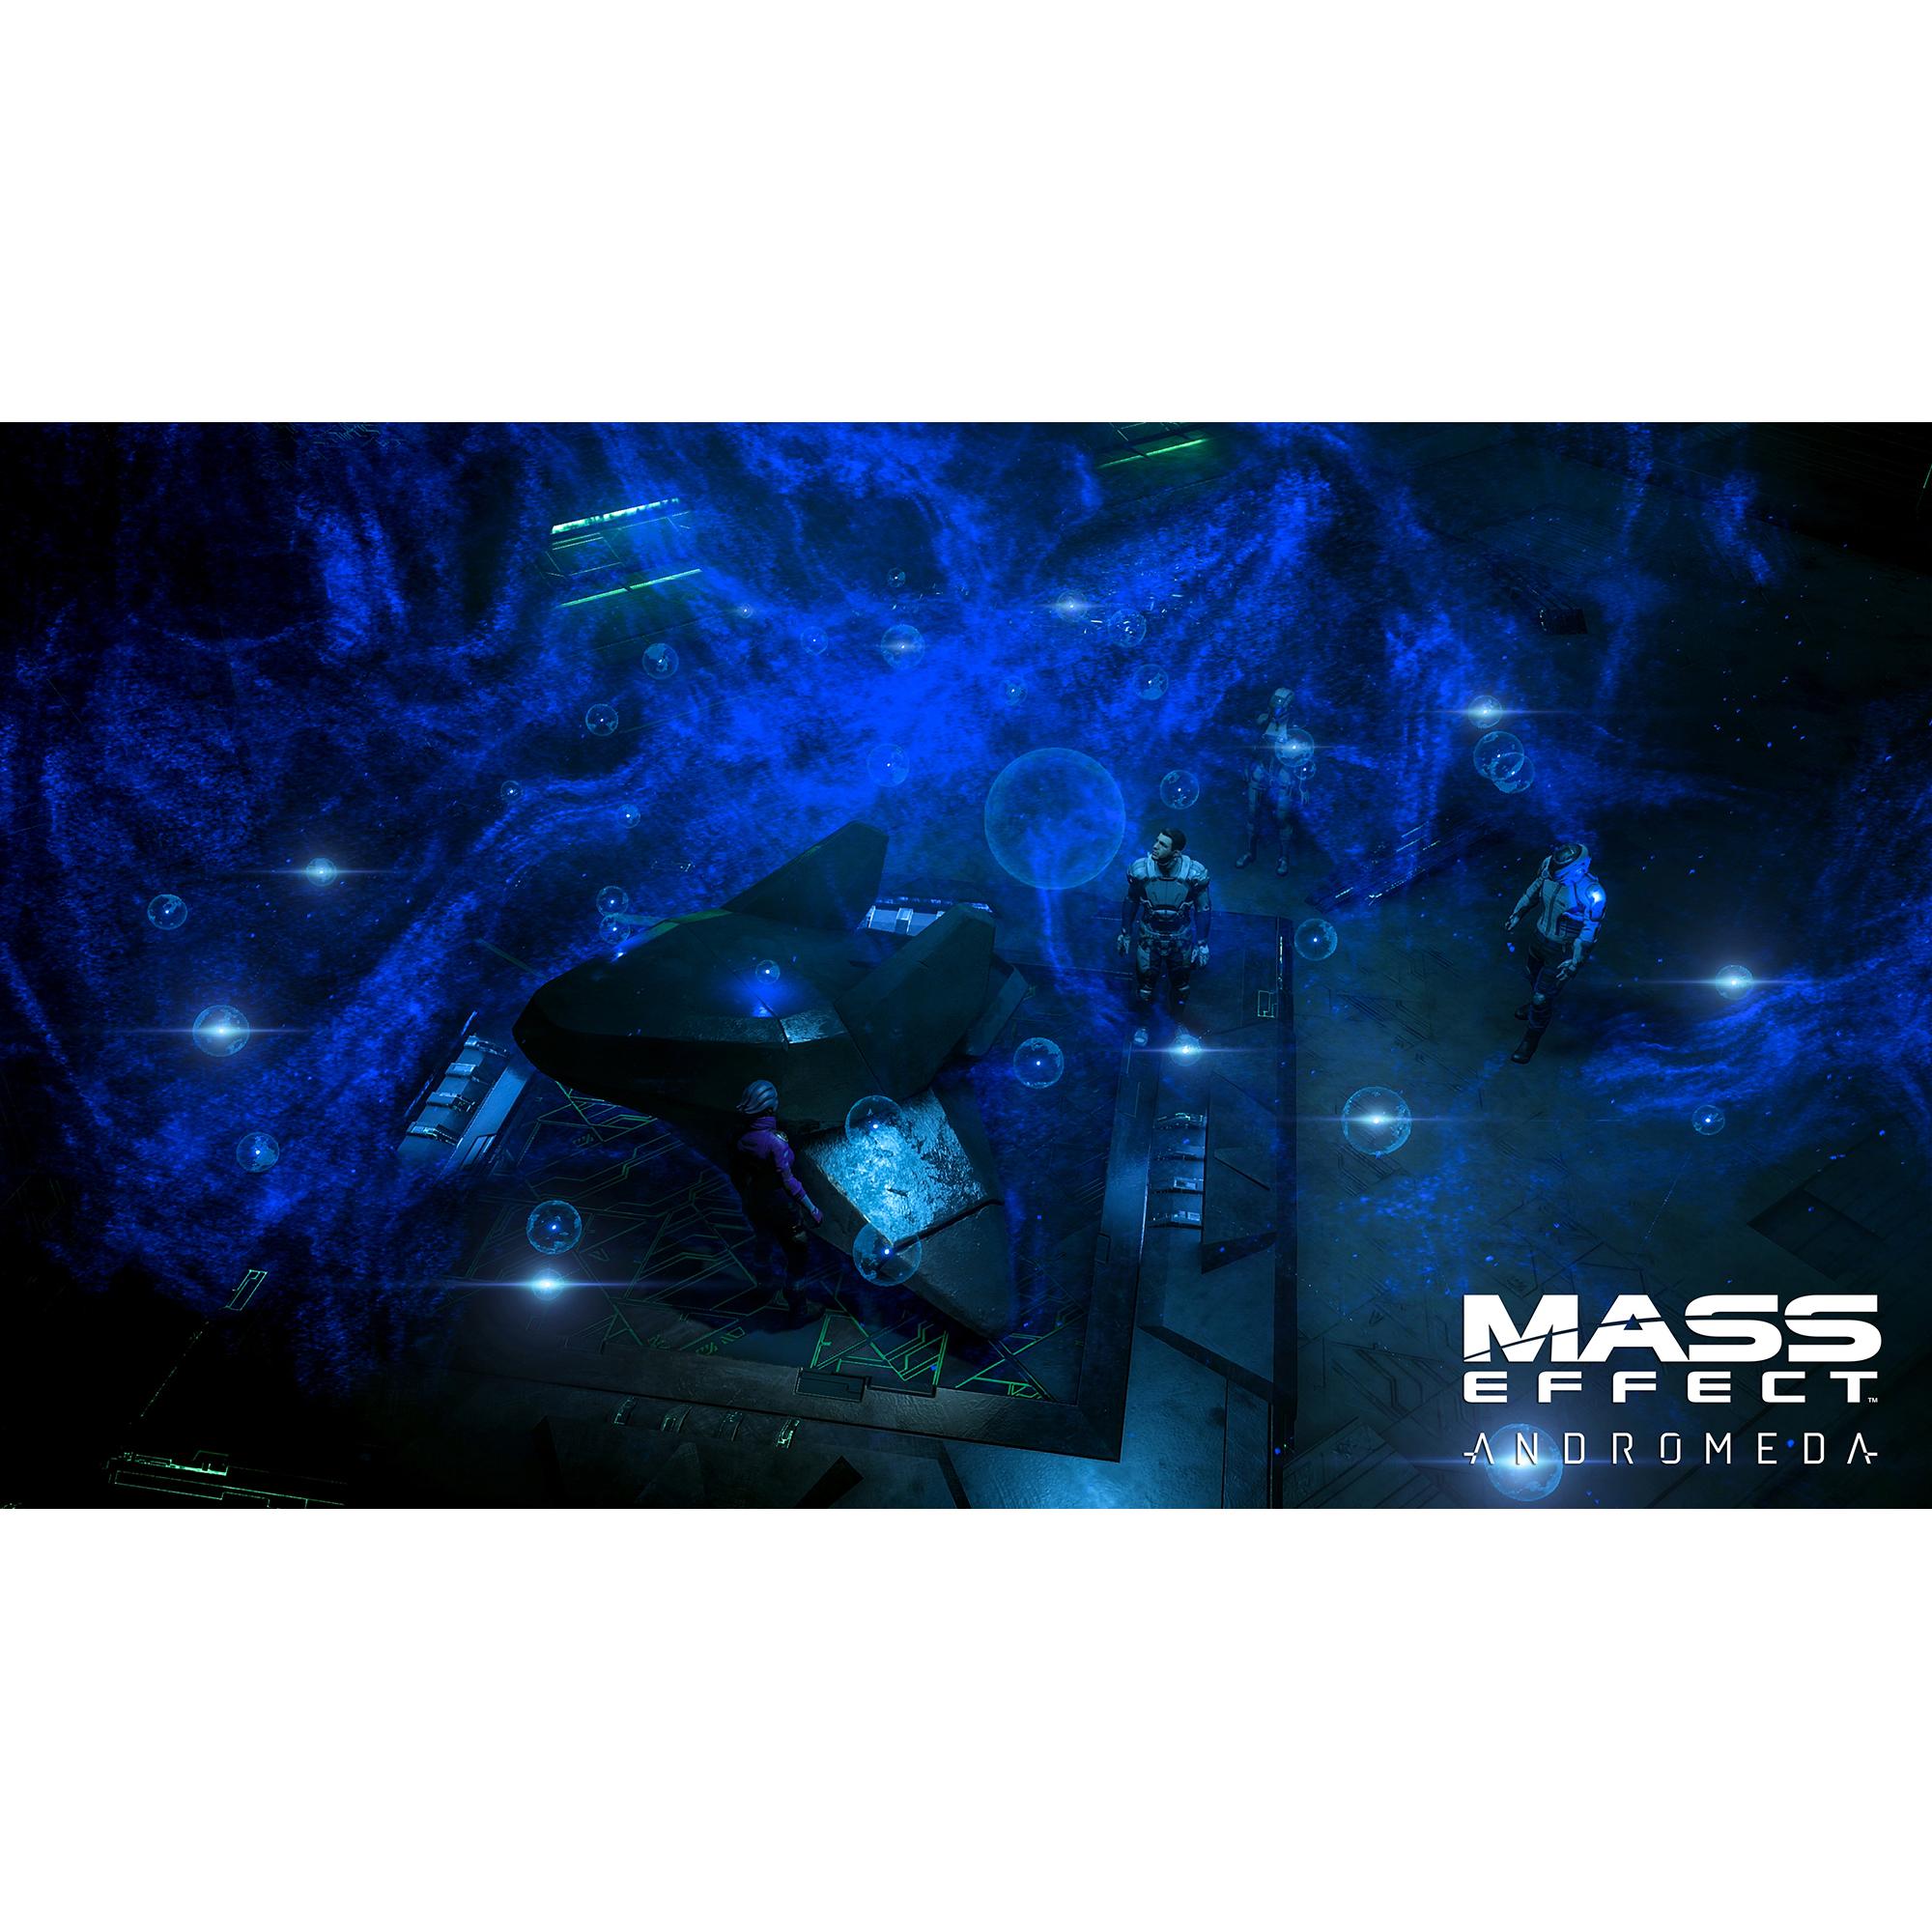 Joc Mass Effect: Andromeda pentru Xbox One 7